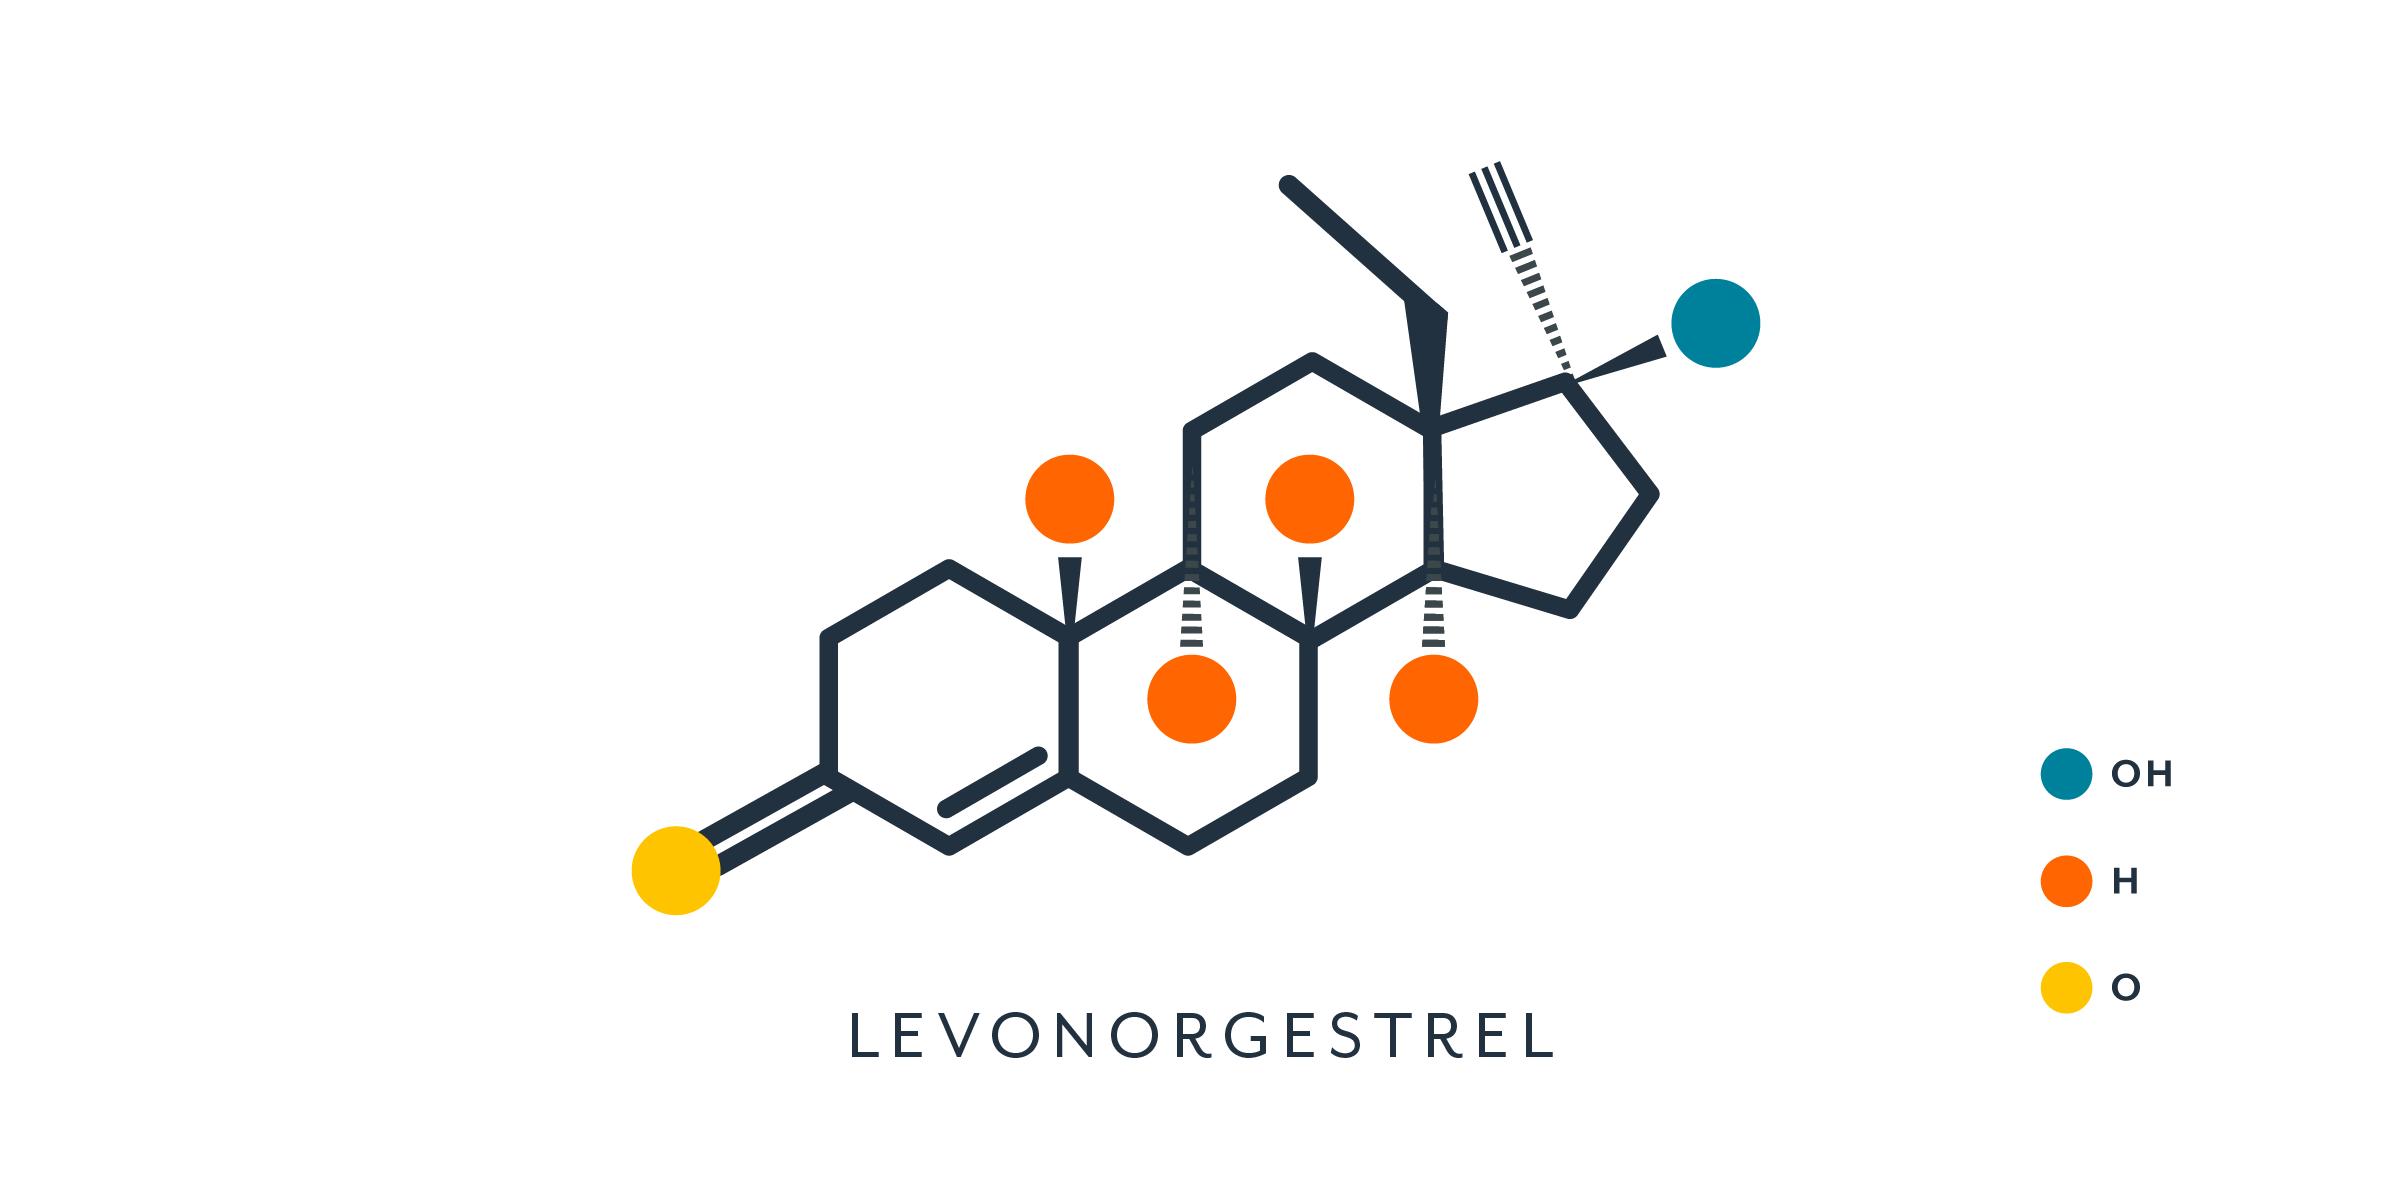 Progesterone: Definition, Levels, Symptoms of Low